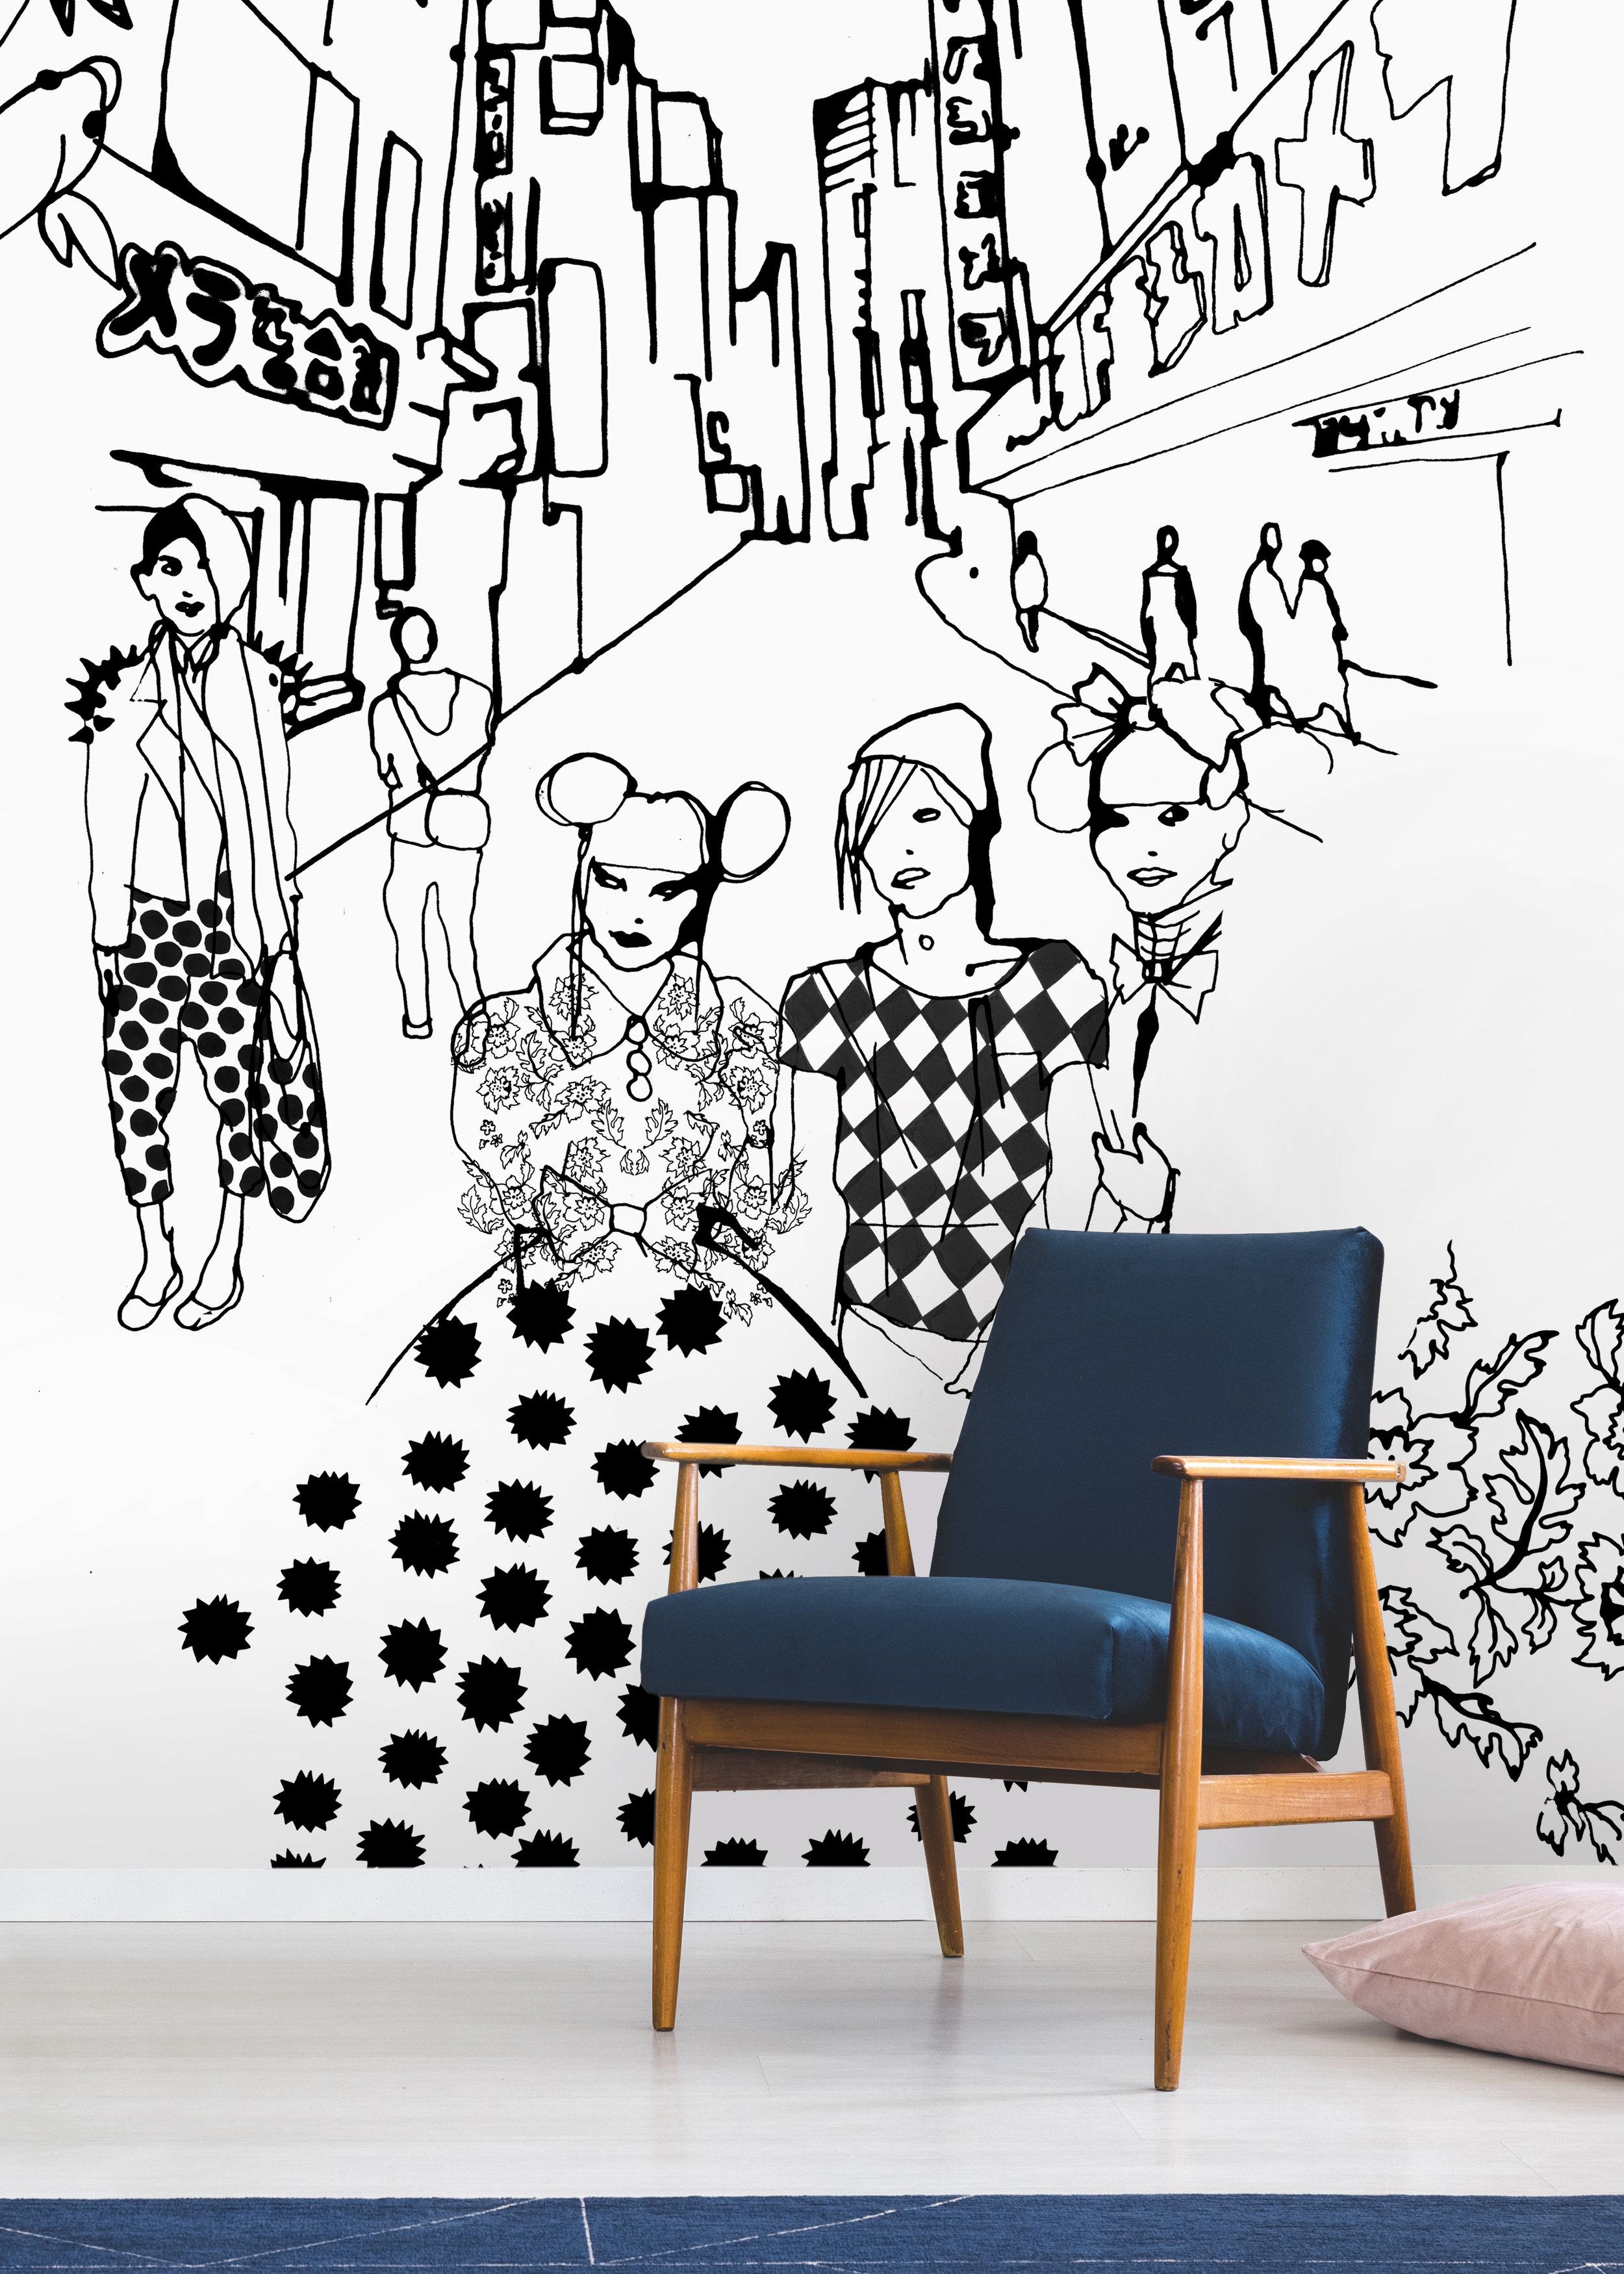 tokyo-stina-wirsen-original-wallpaper-interior242_33196542698_o.jpg